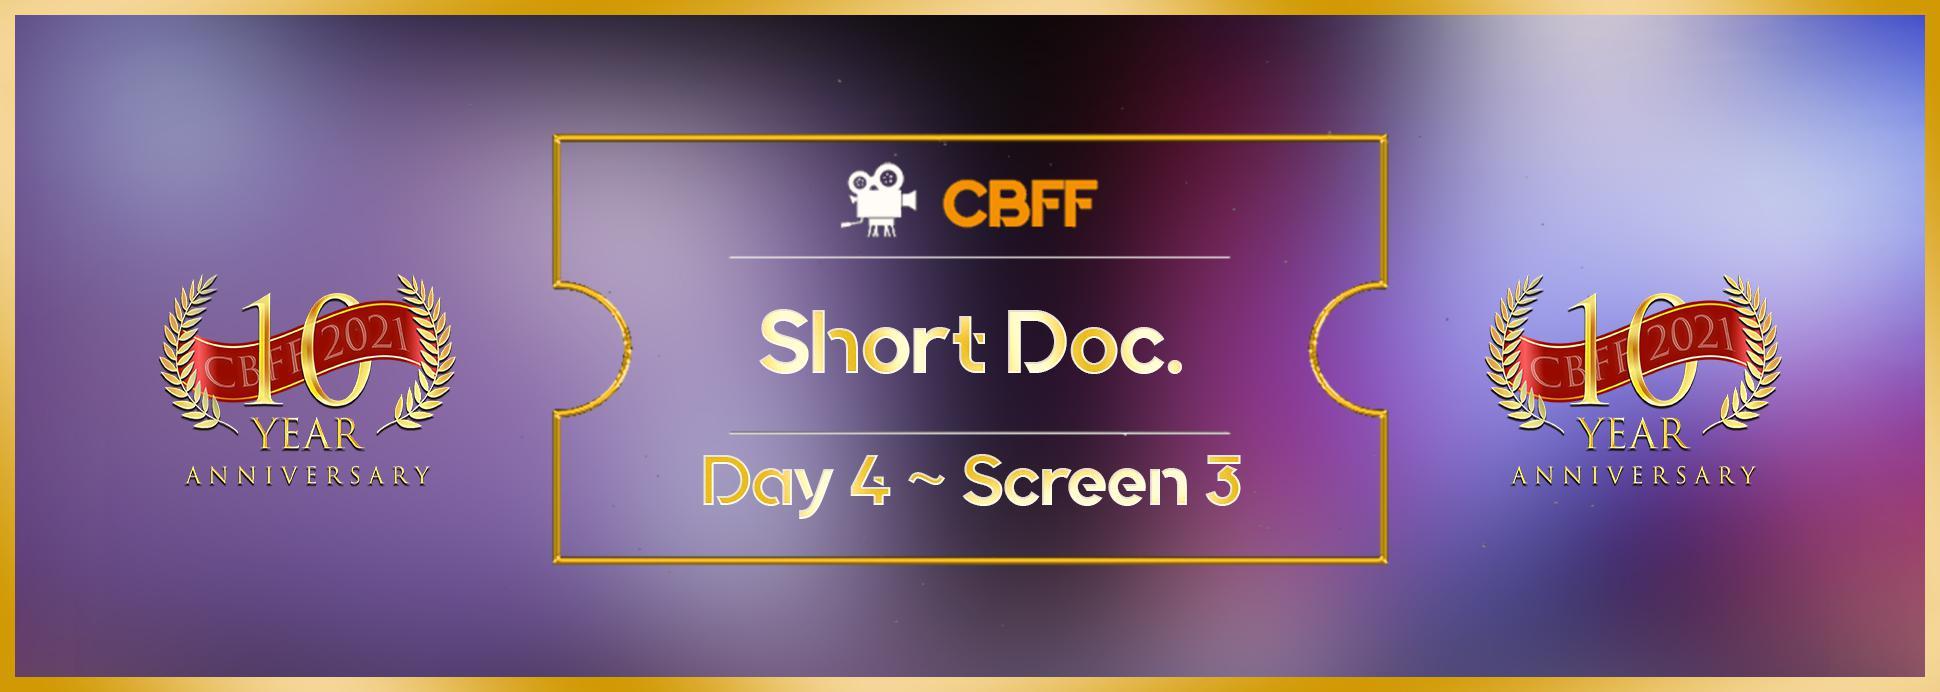 Day 4, Screen 3: Short Documentary 3